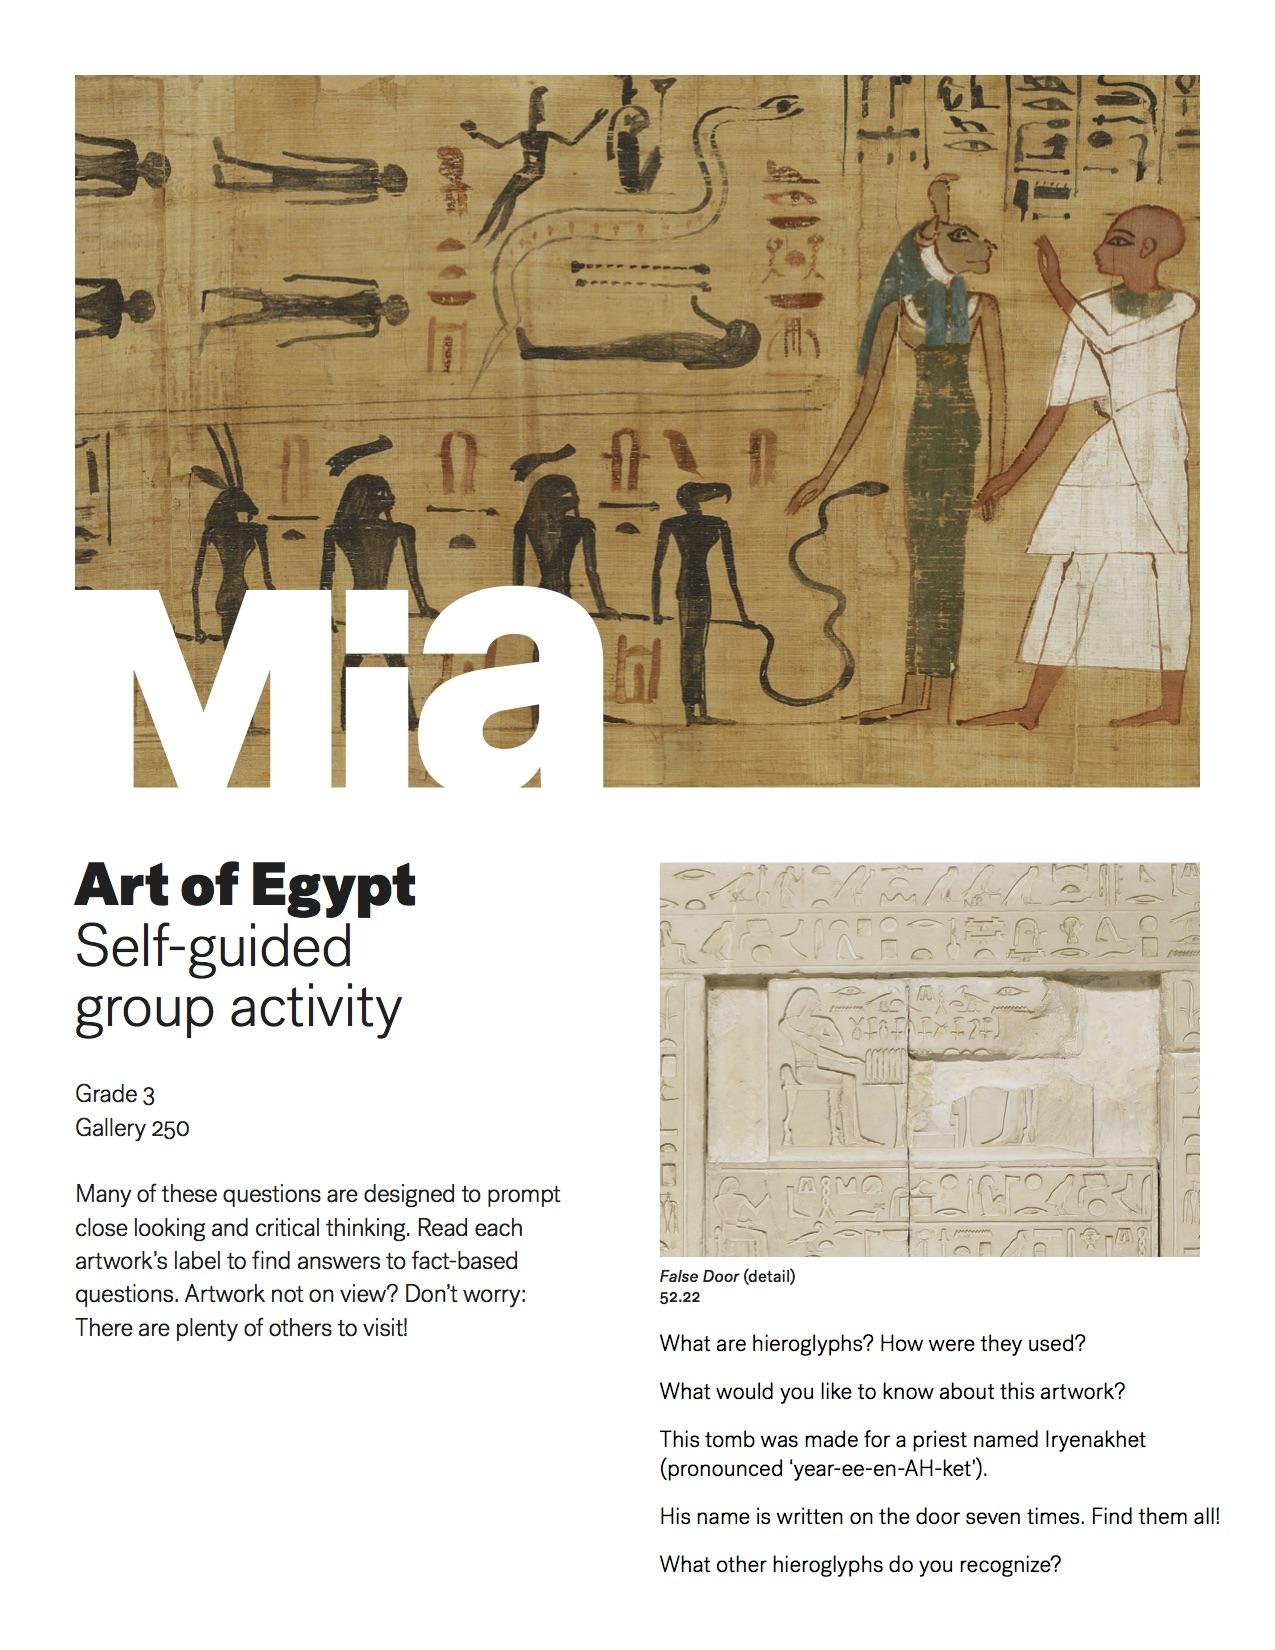 SelfGuidedTour_ArtEgypt